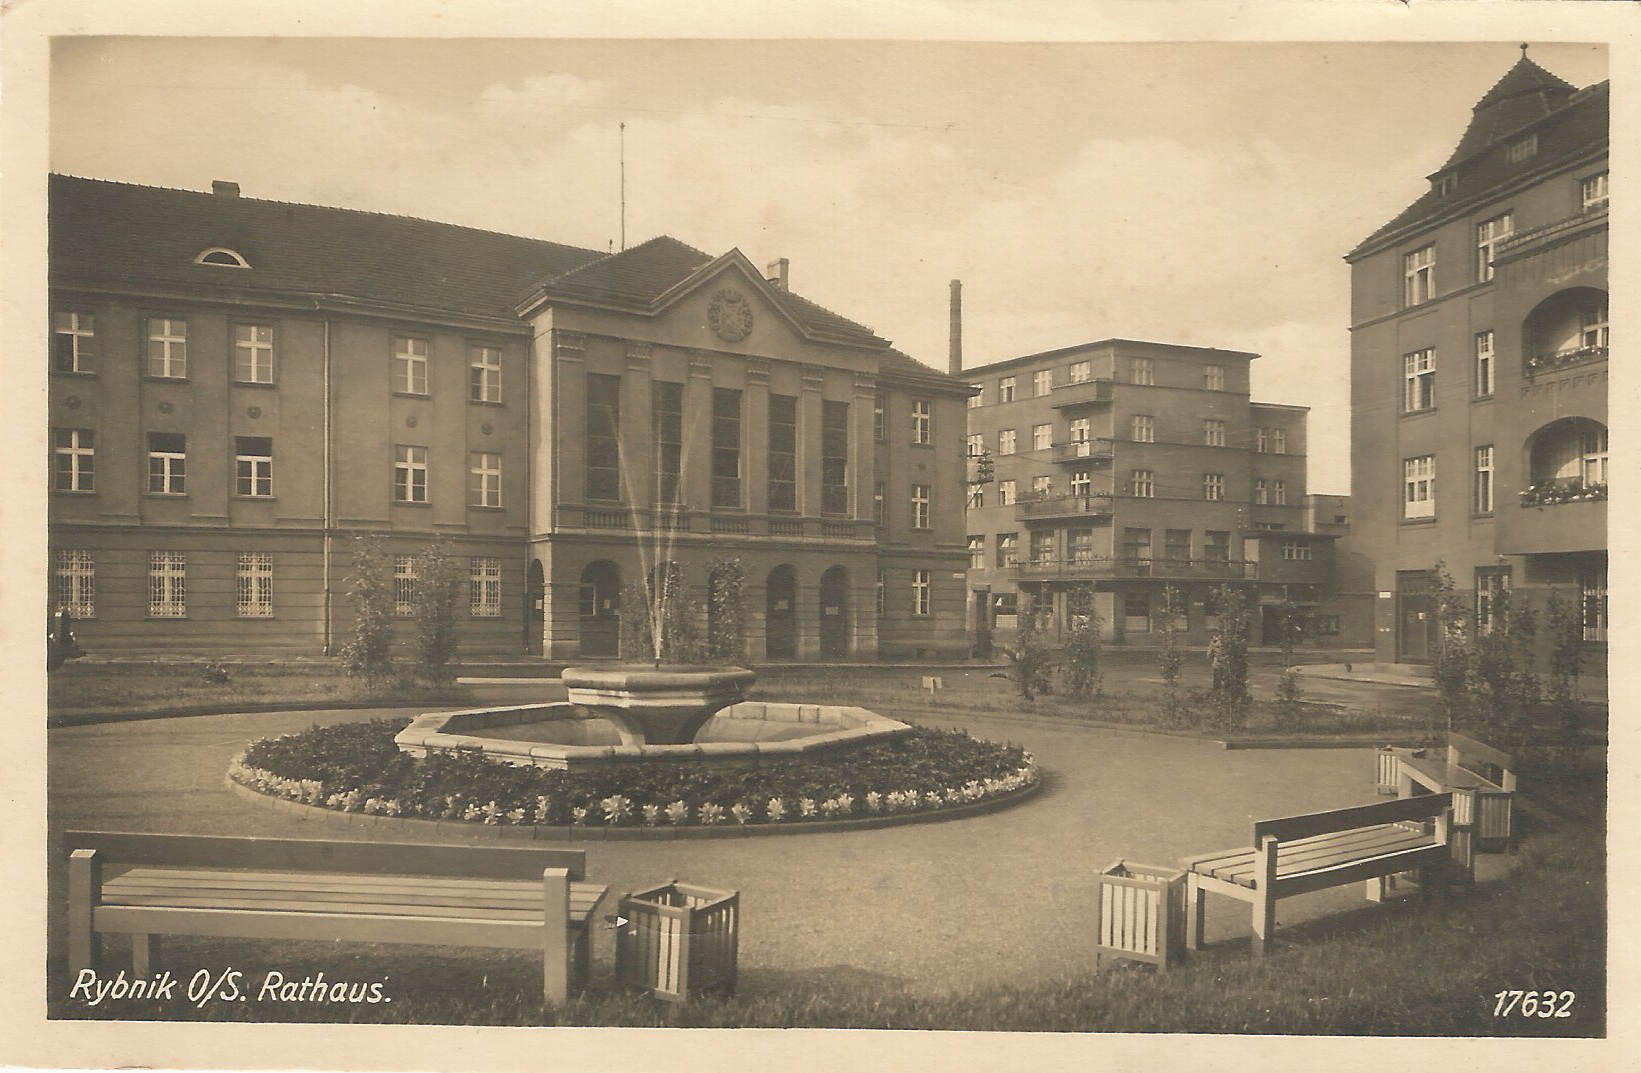 Rybnik - Rathaus